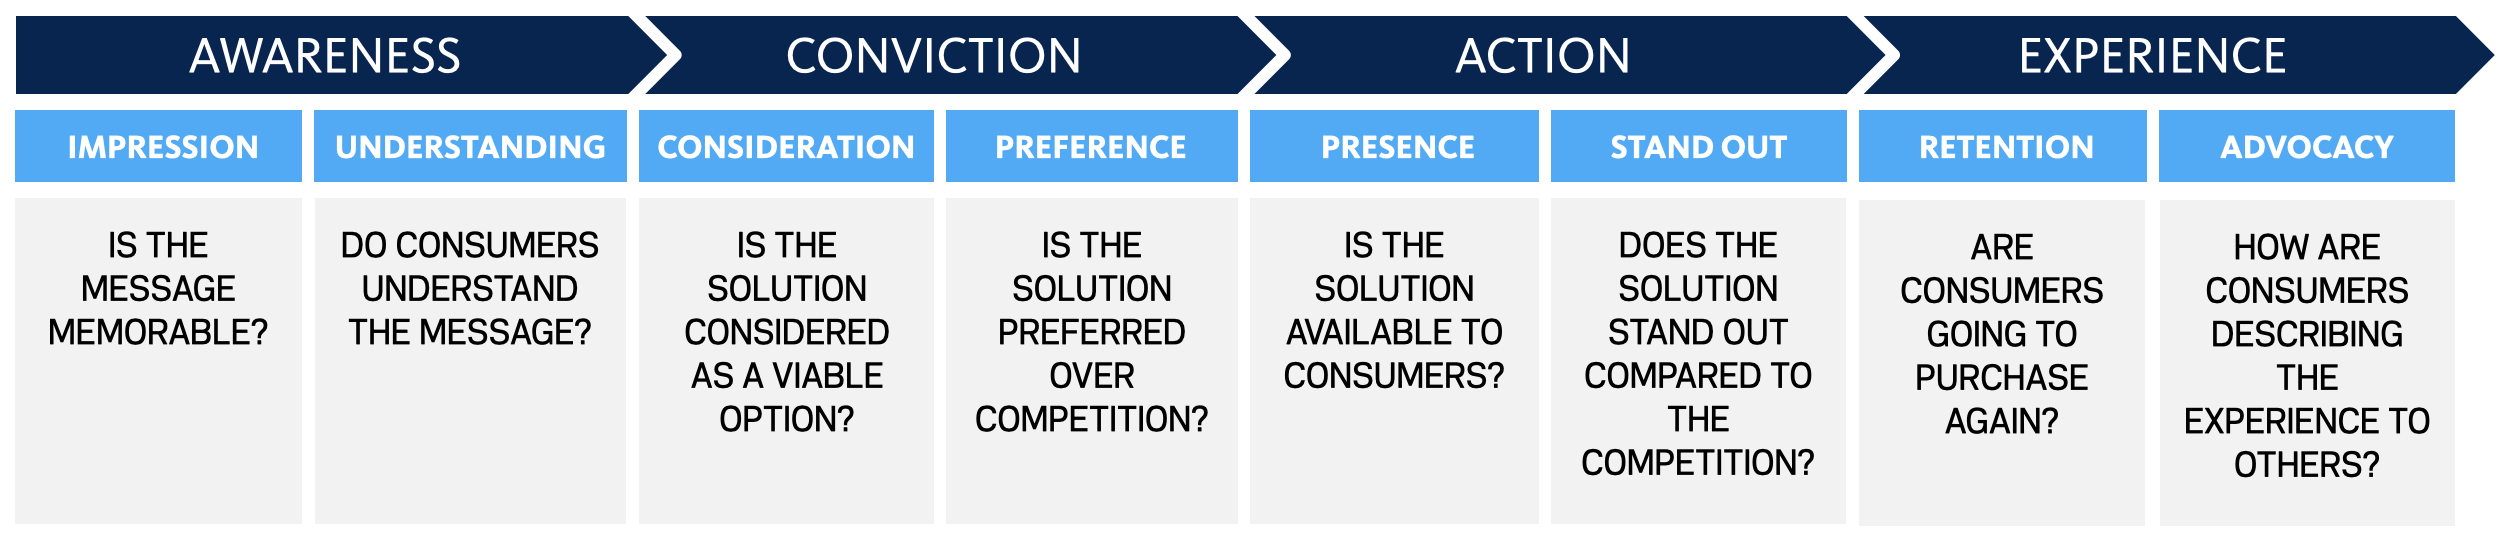 The Consumer Journey according to MASSIVE